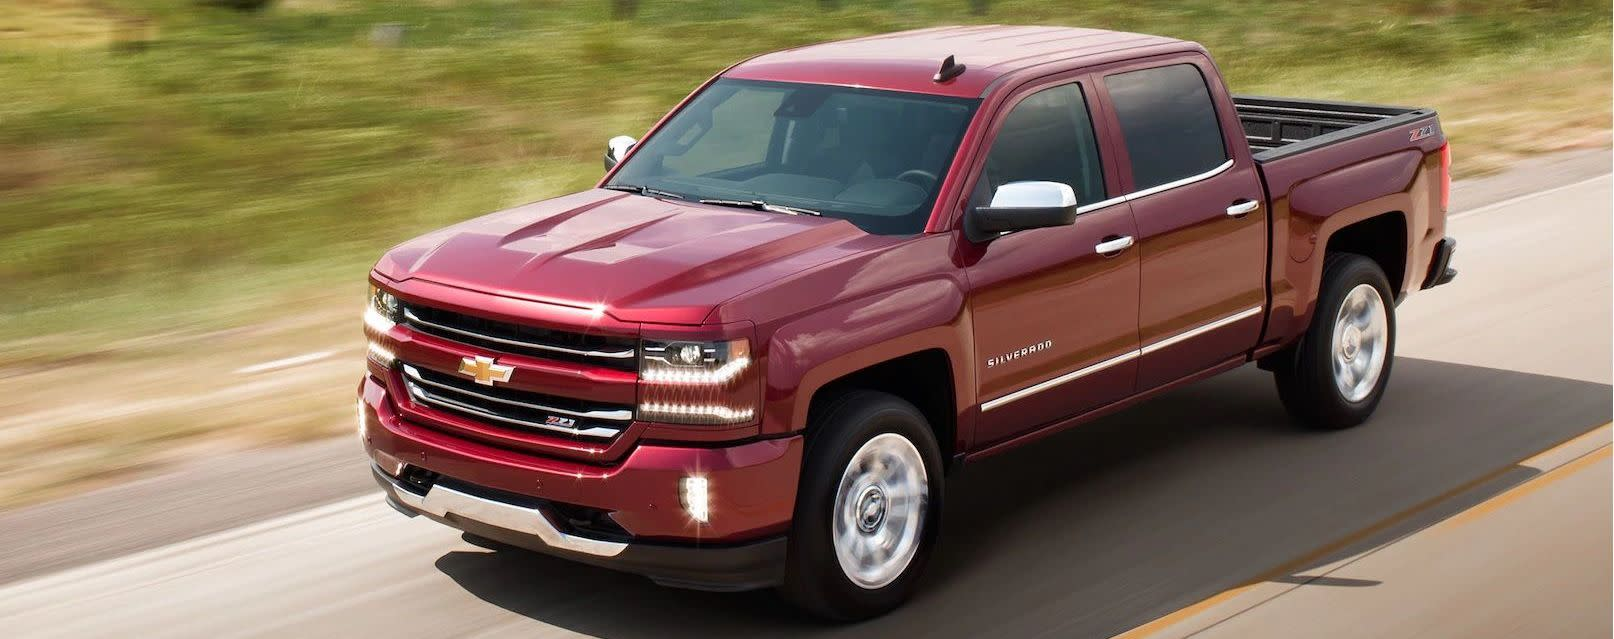 2017 Chevrolet Silverado 1500 for Sale near Lancaster, PA - Jeff D